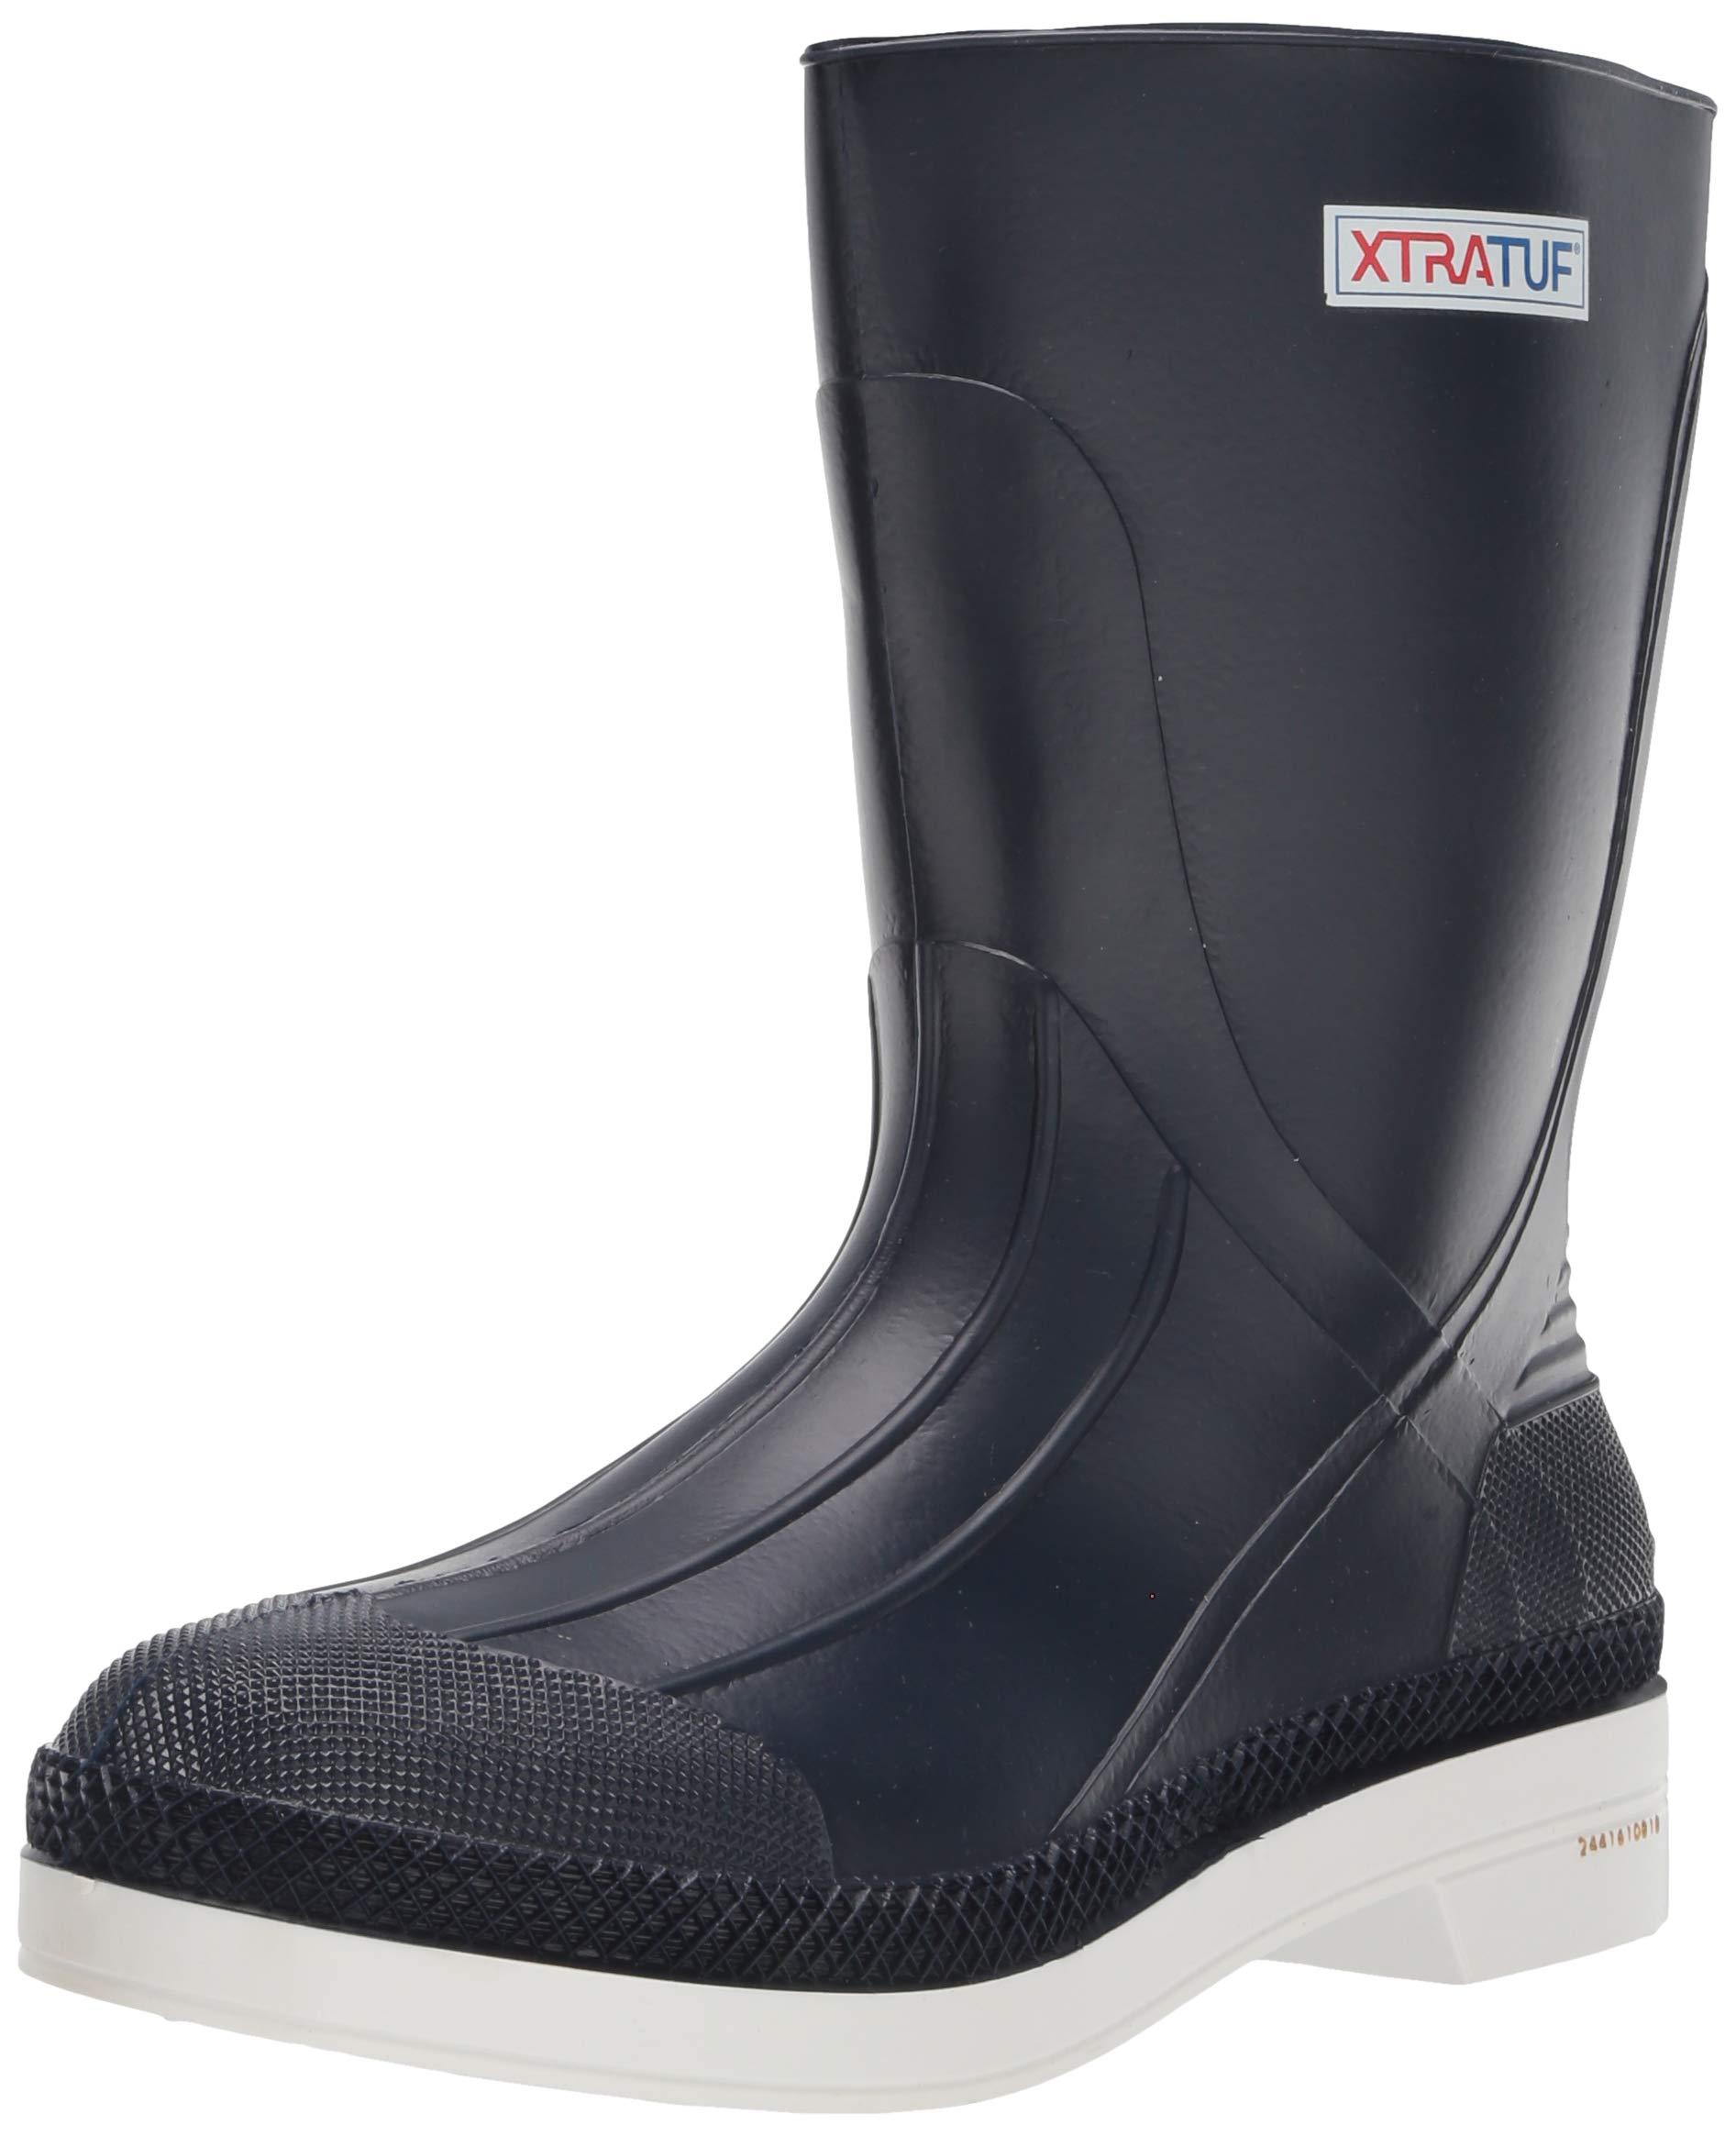 XTRATUF 11'' Men's PVC Shrimp Boots, Navy (75137) by Xtratuf